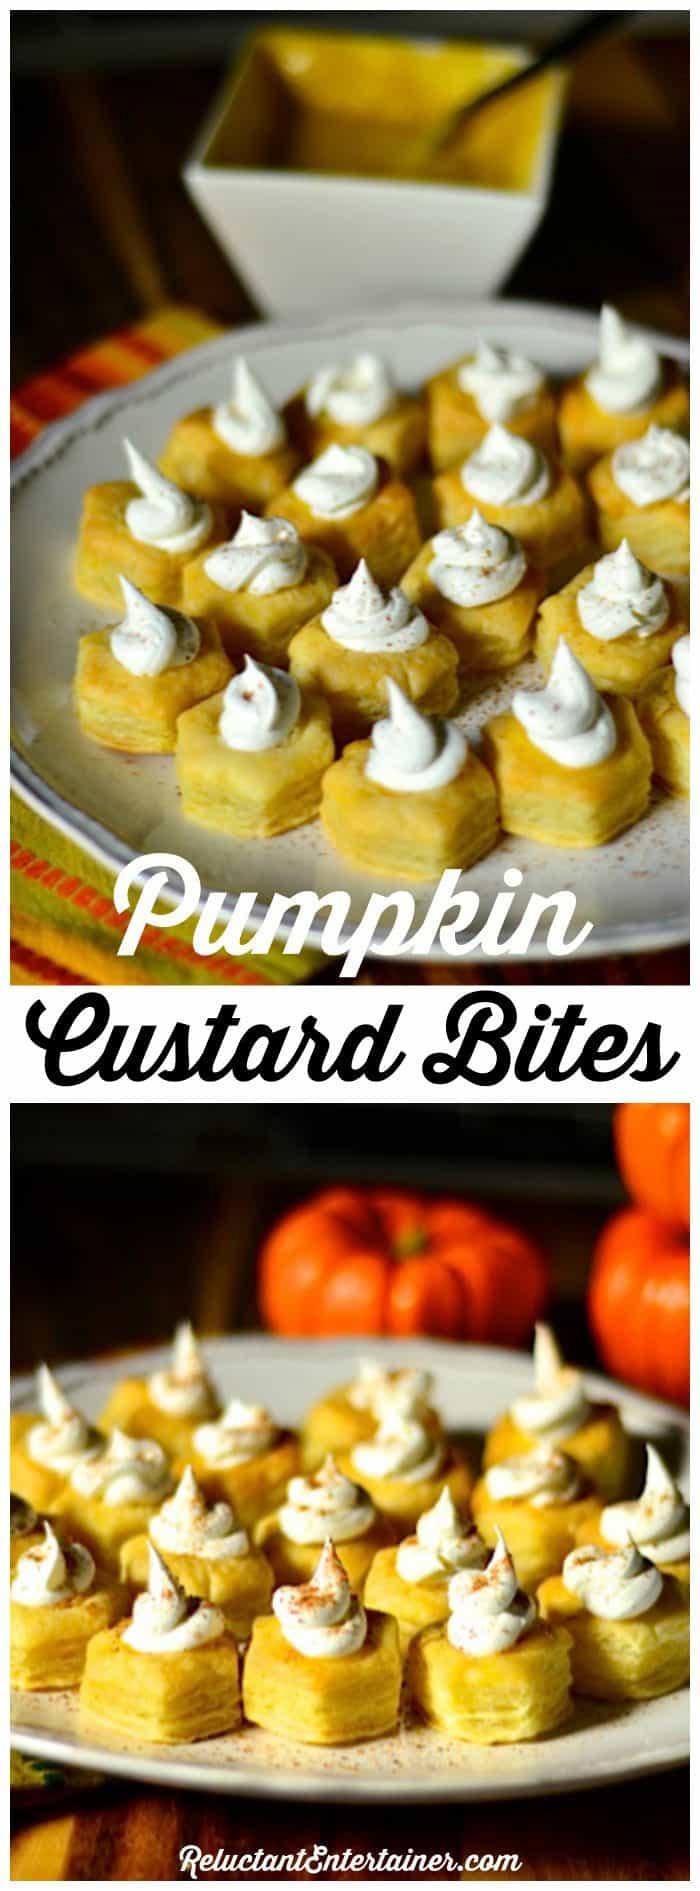 Pumpkin Custard Bites